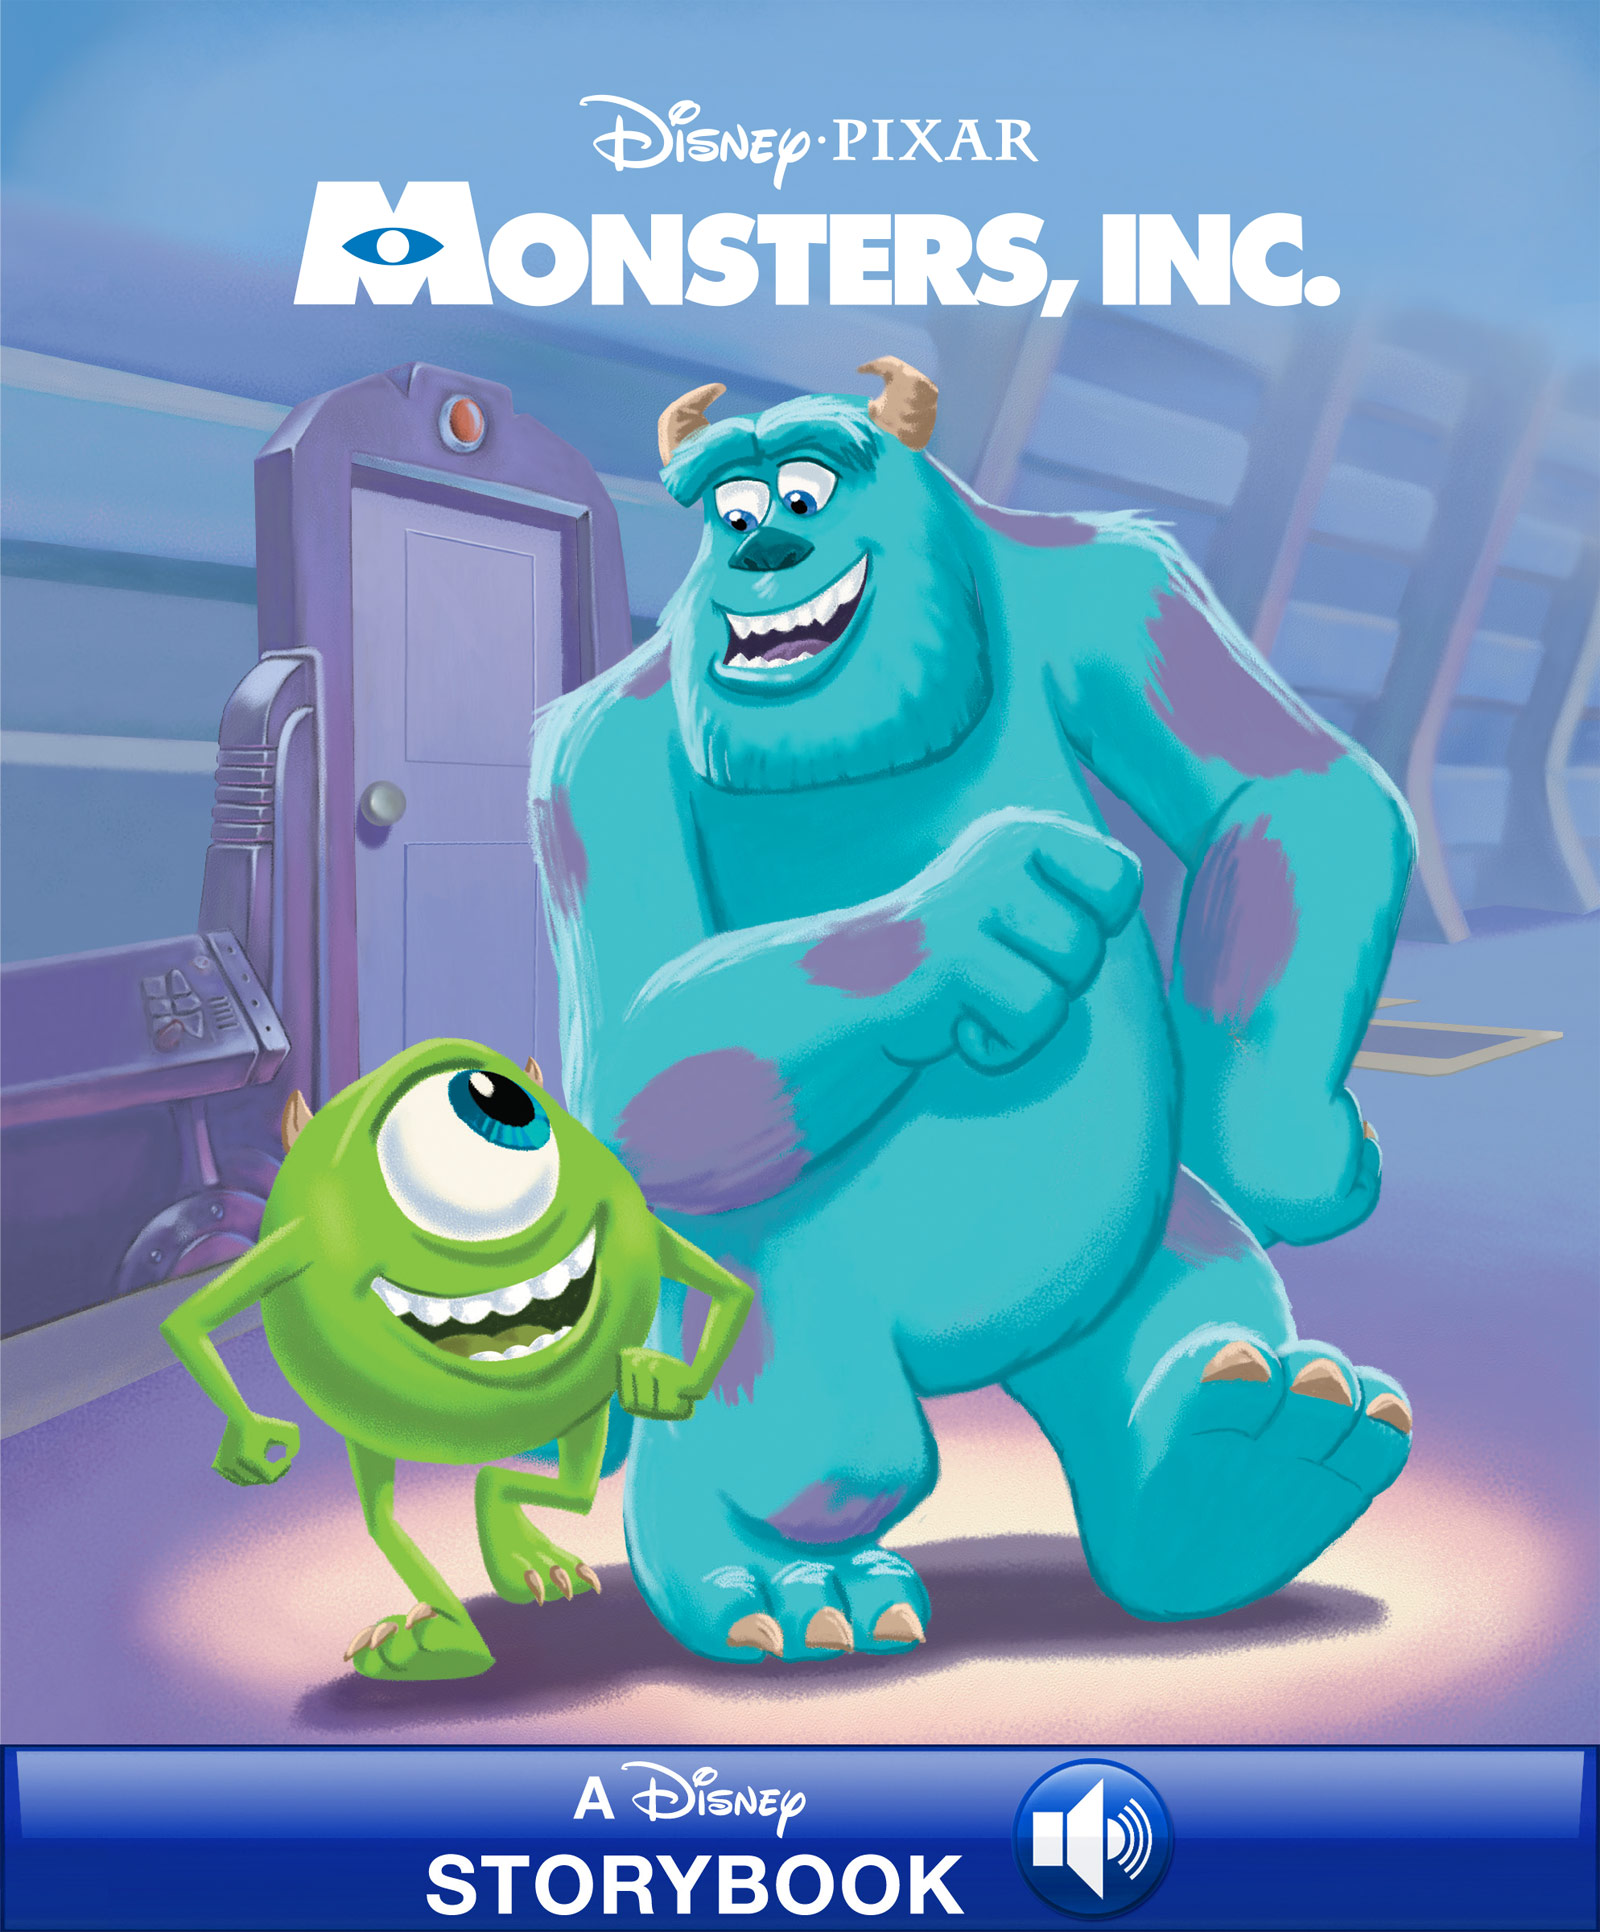 Disney Classic Stories: Monsters, Inc. A Disney Read-Along